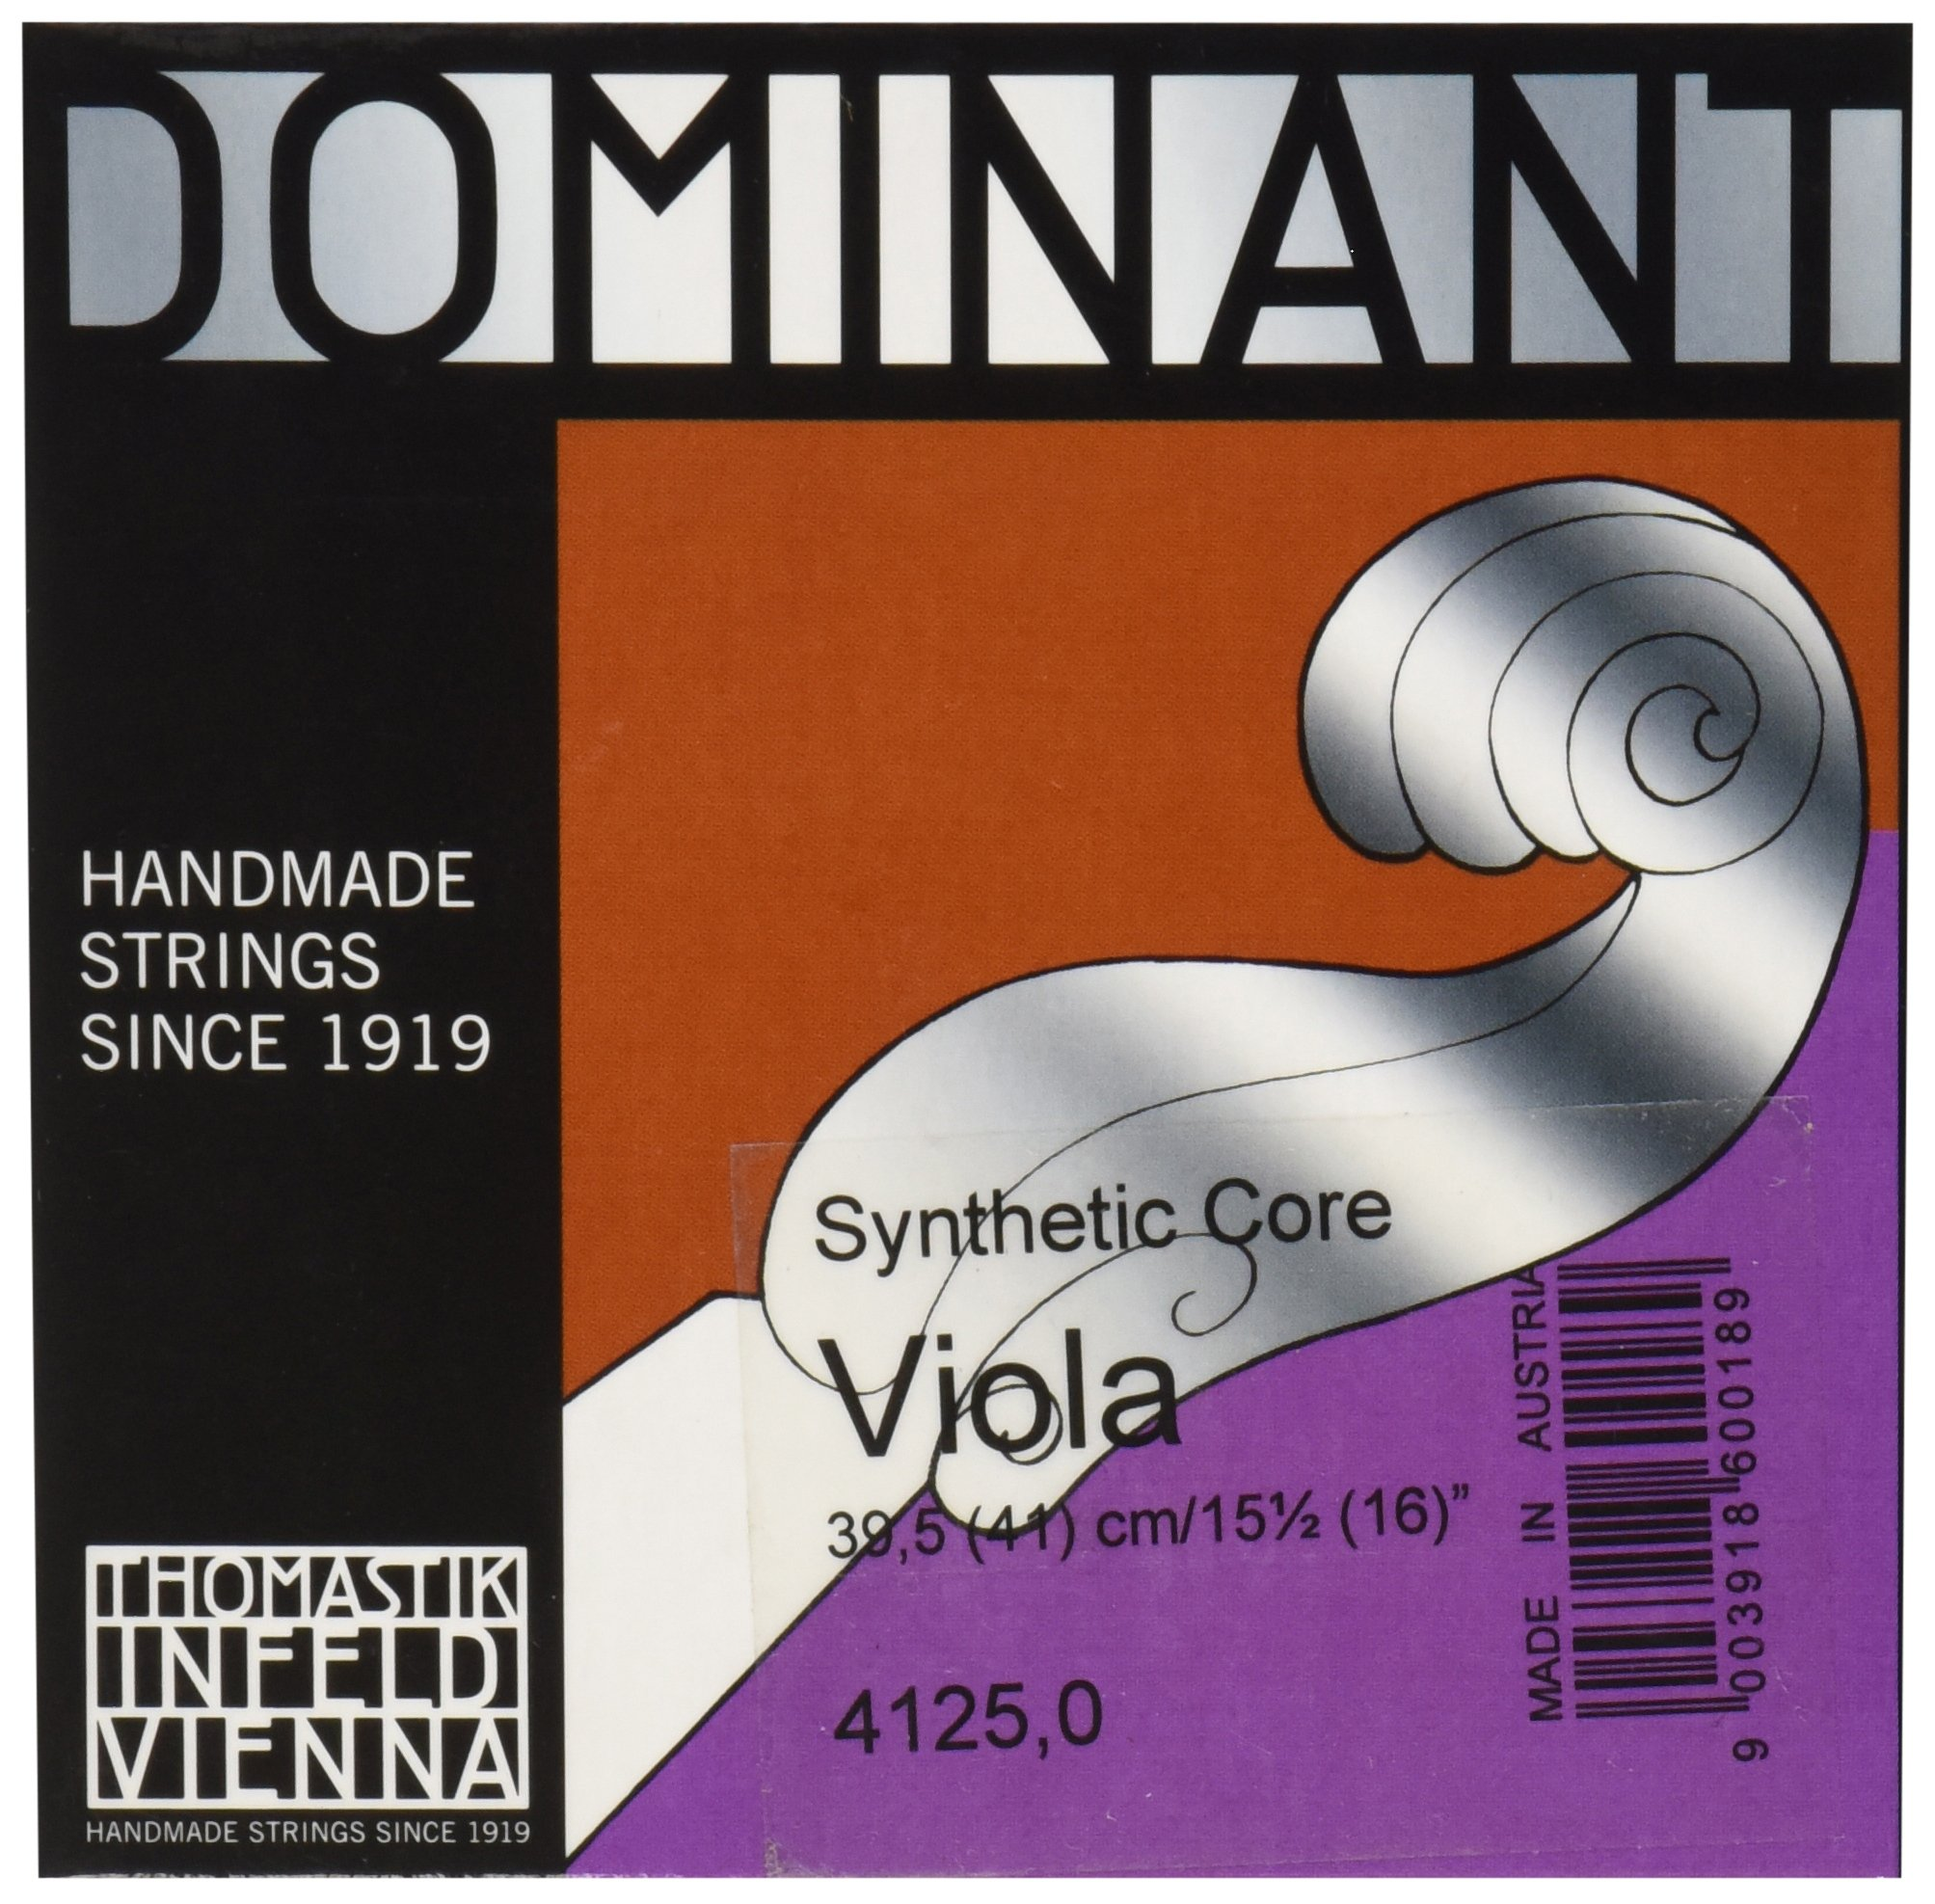 Thomastik-Infeld 4125 Dominant, Viola Strings, Complete Set, 16-Inch